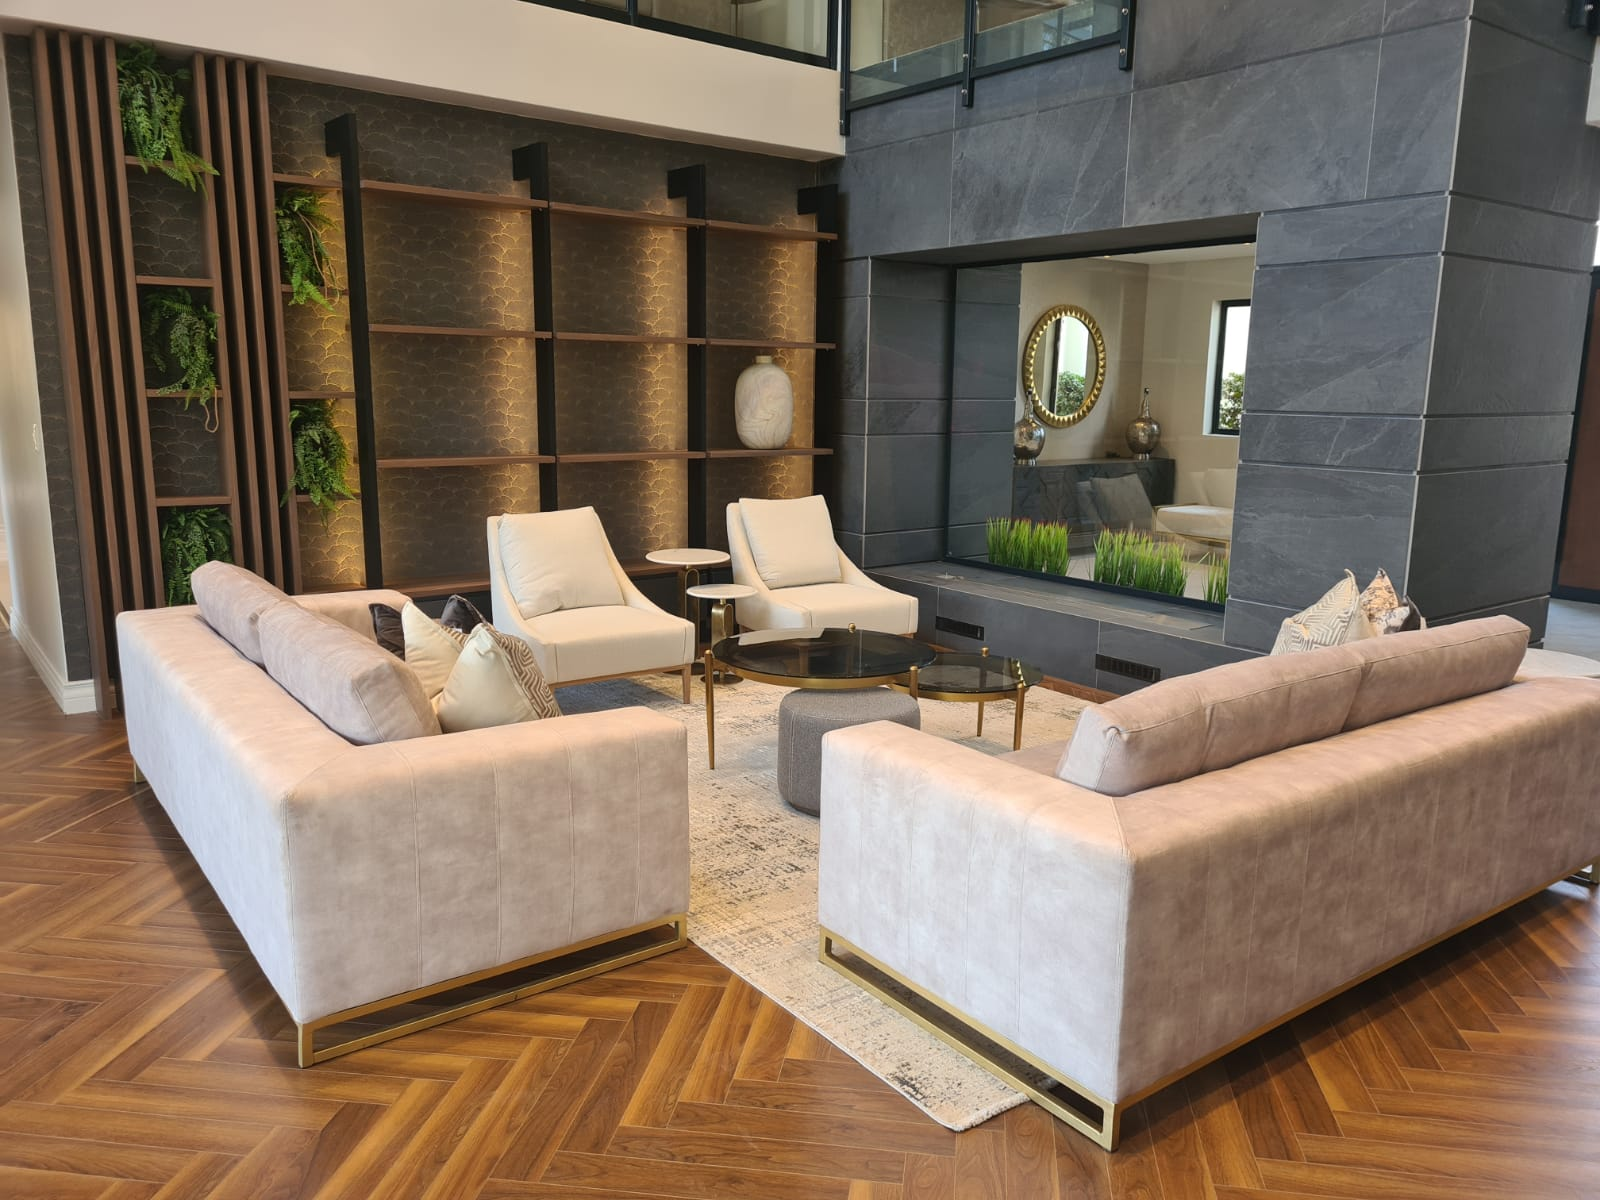 Top carpets in northcliff - Herringbone installation